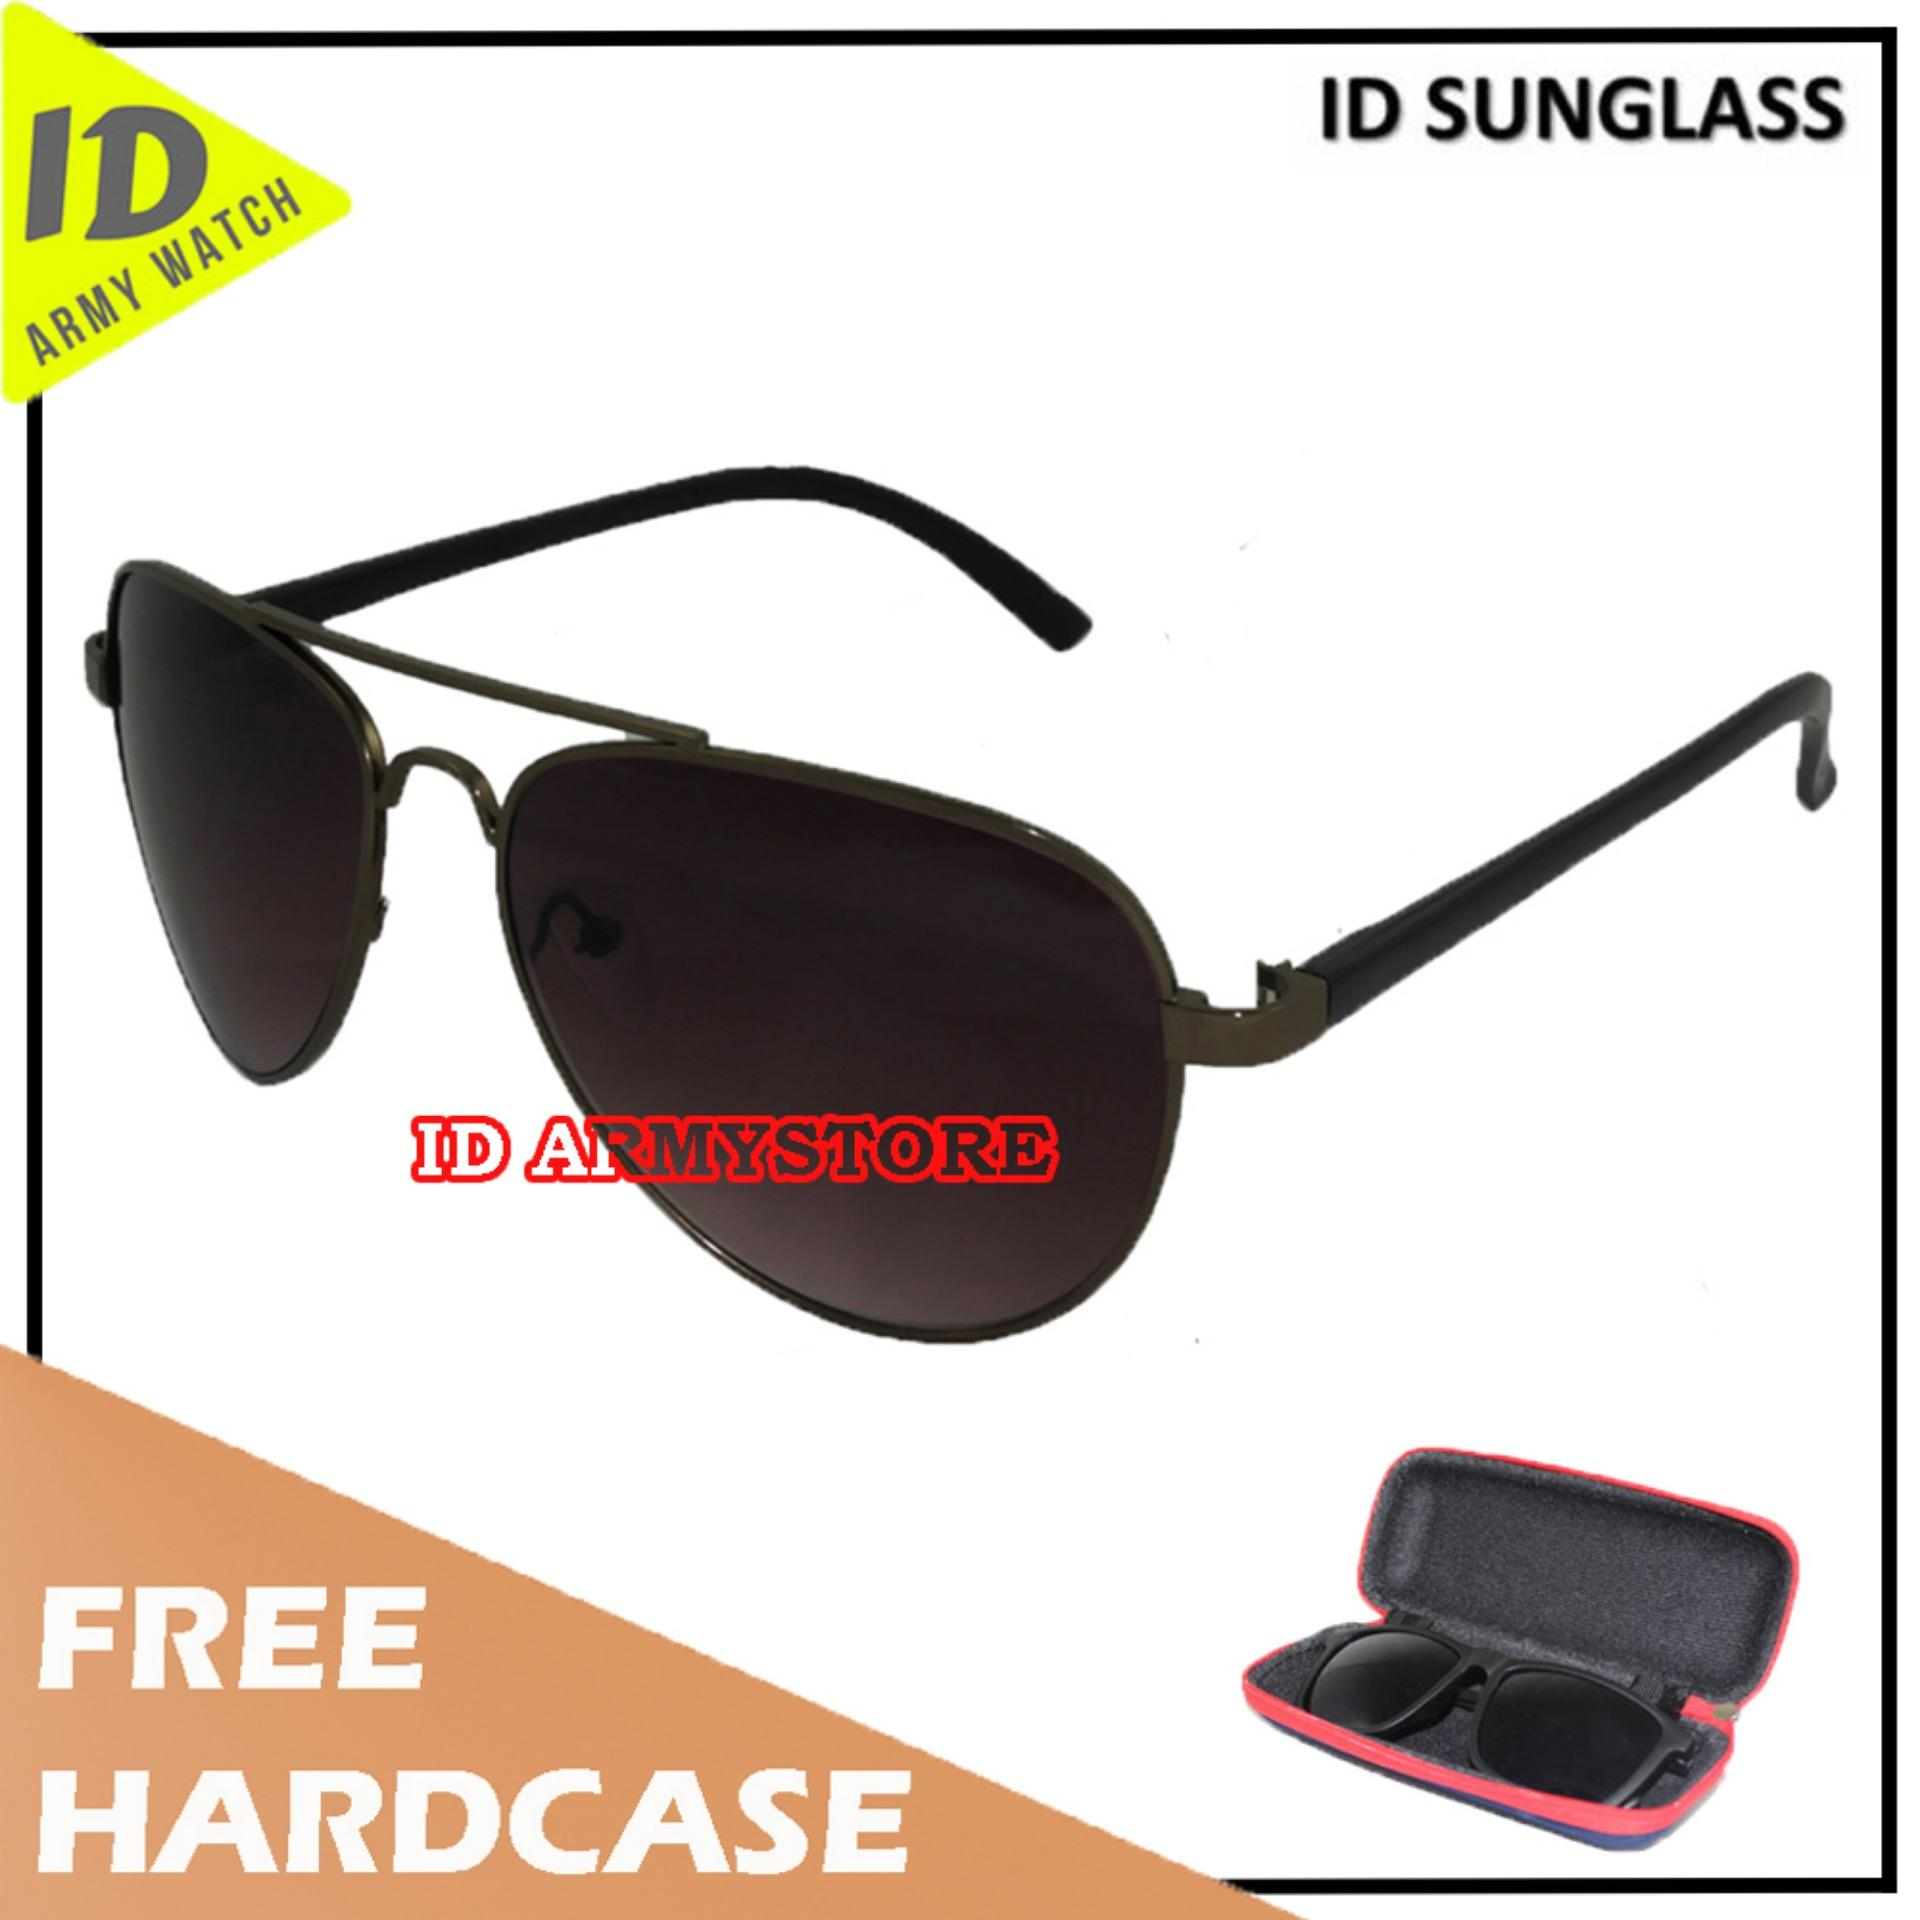 ID Sunglass - Kacamata Aviat Pria Wanita - Frame Hitam - Lensa Coklat SUN 1003-02